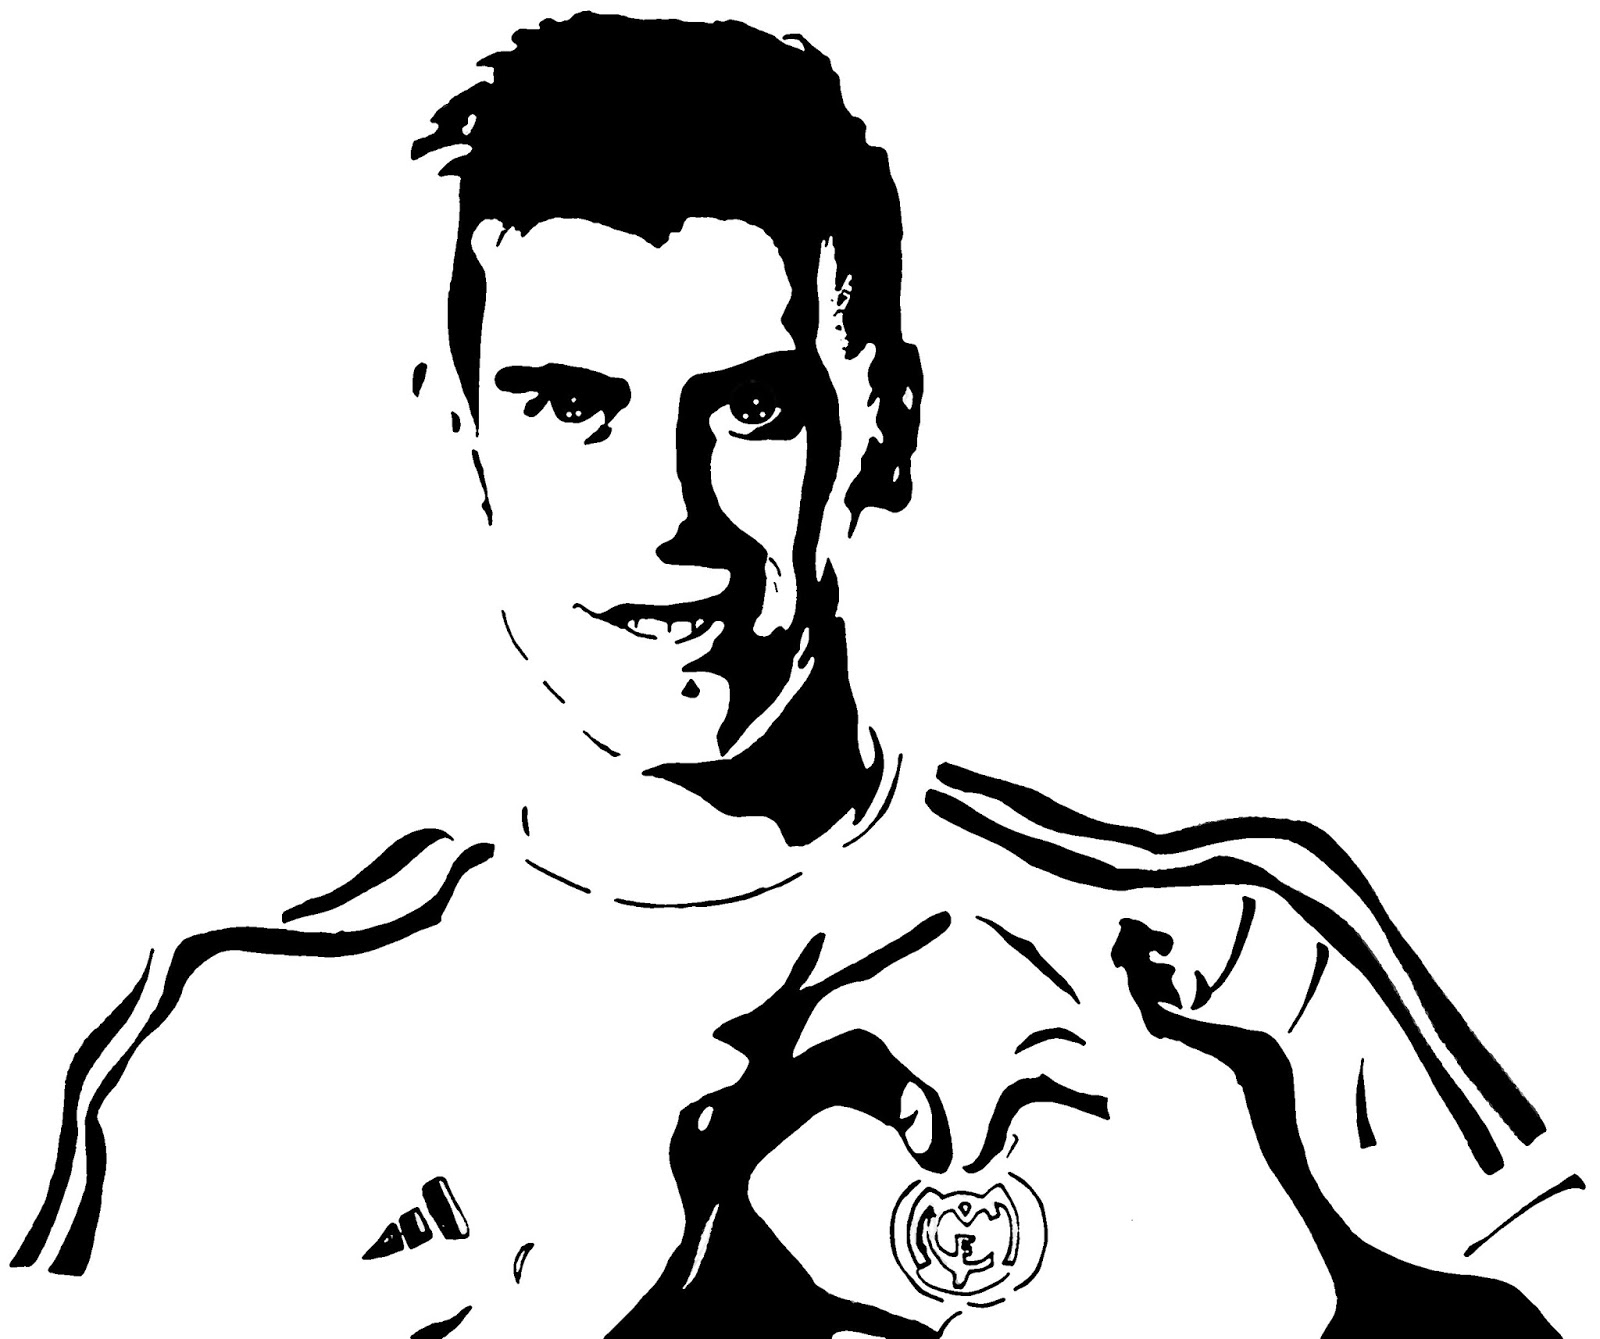 Imagenes De Lionel Messi Para Colorear Primitivelife Pw